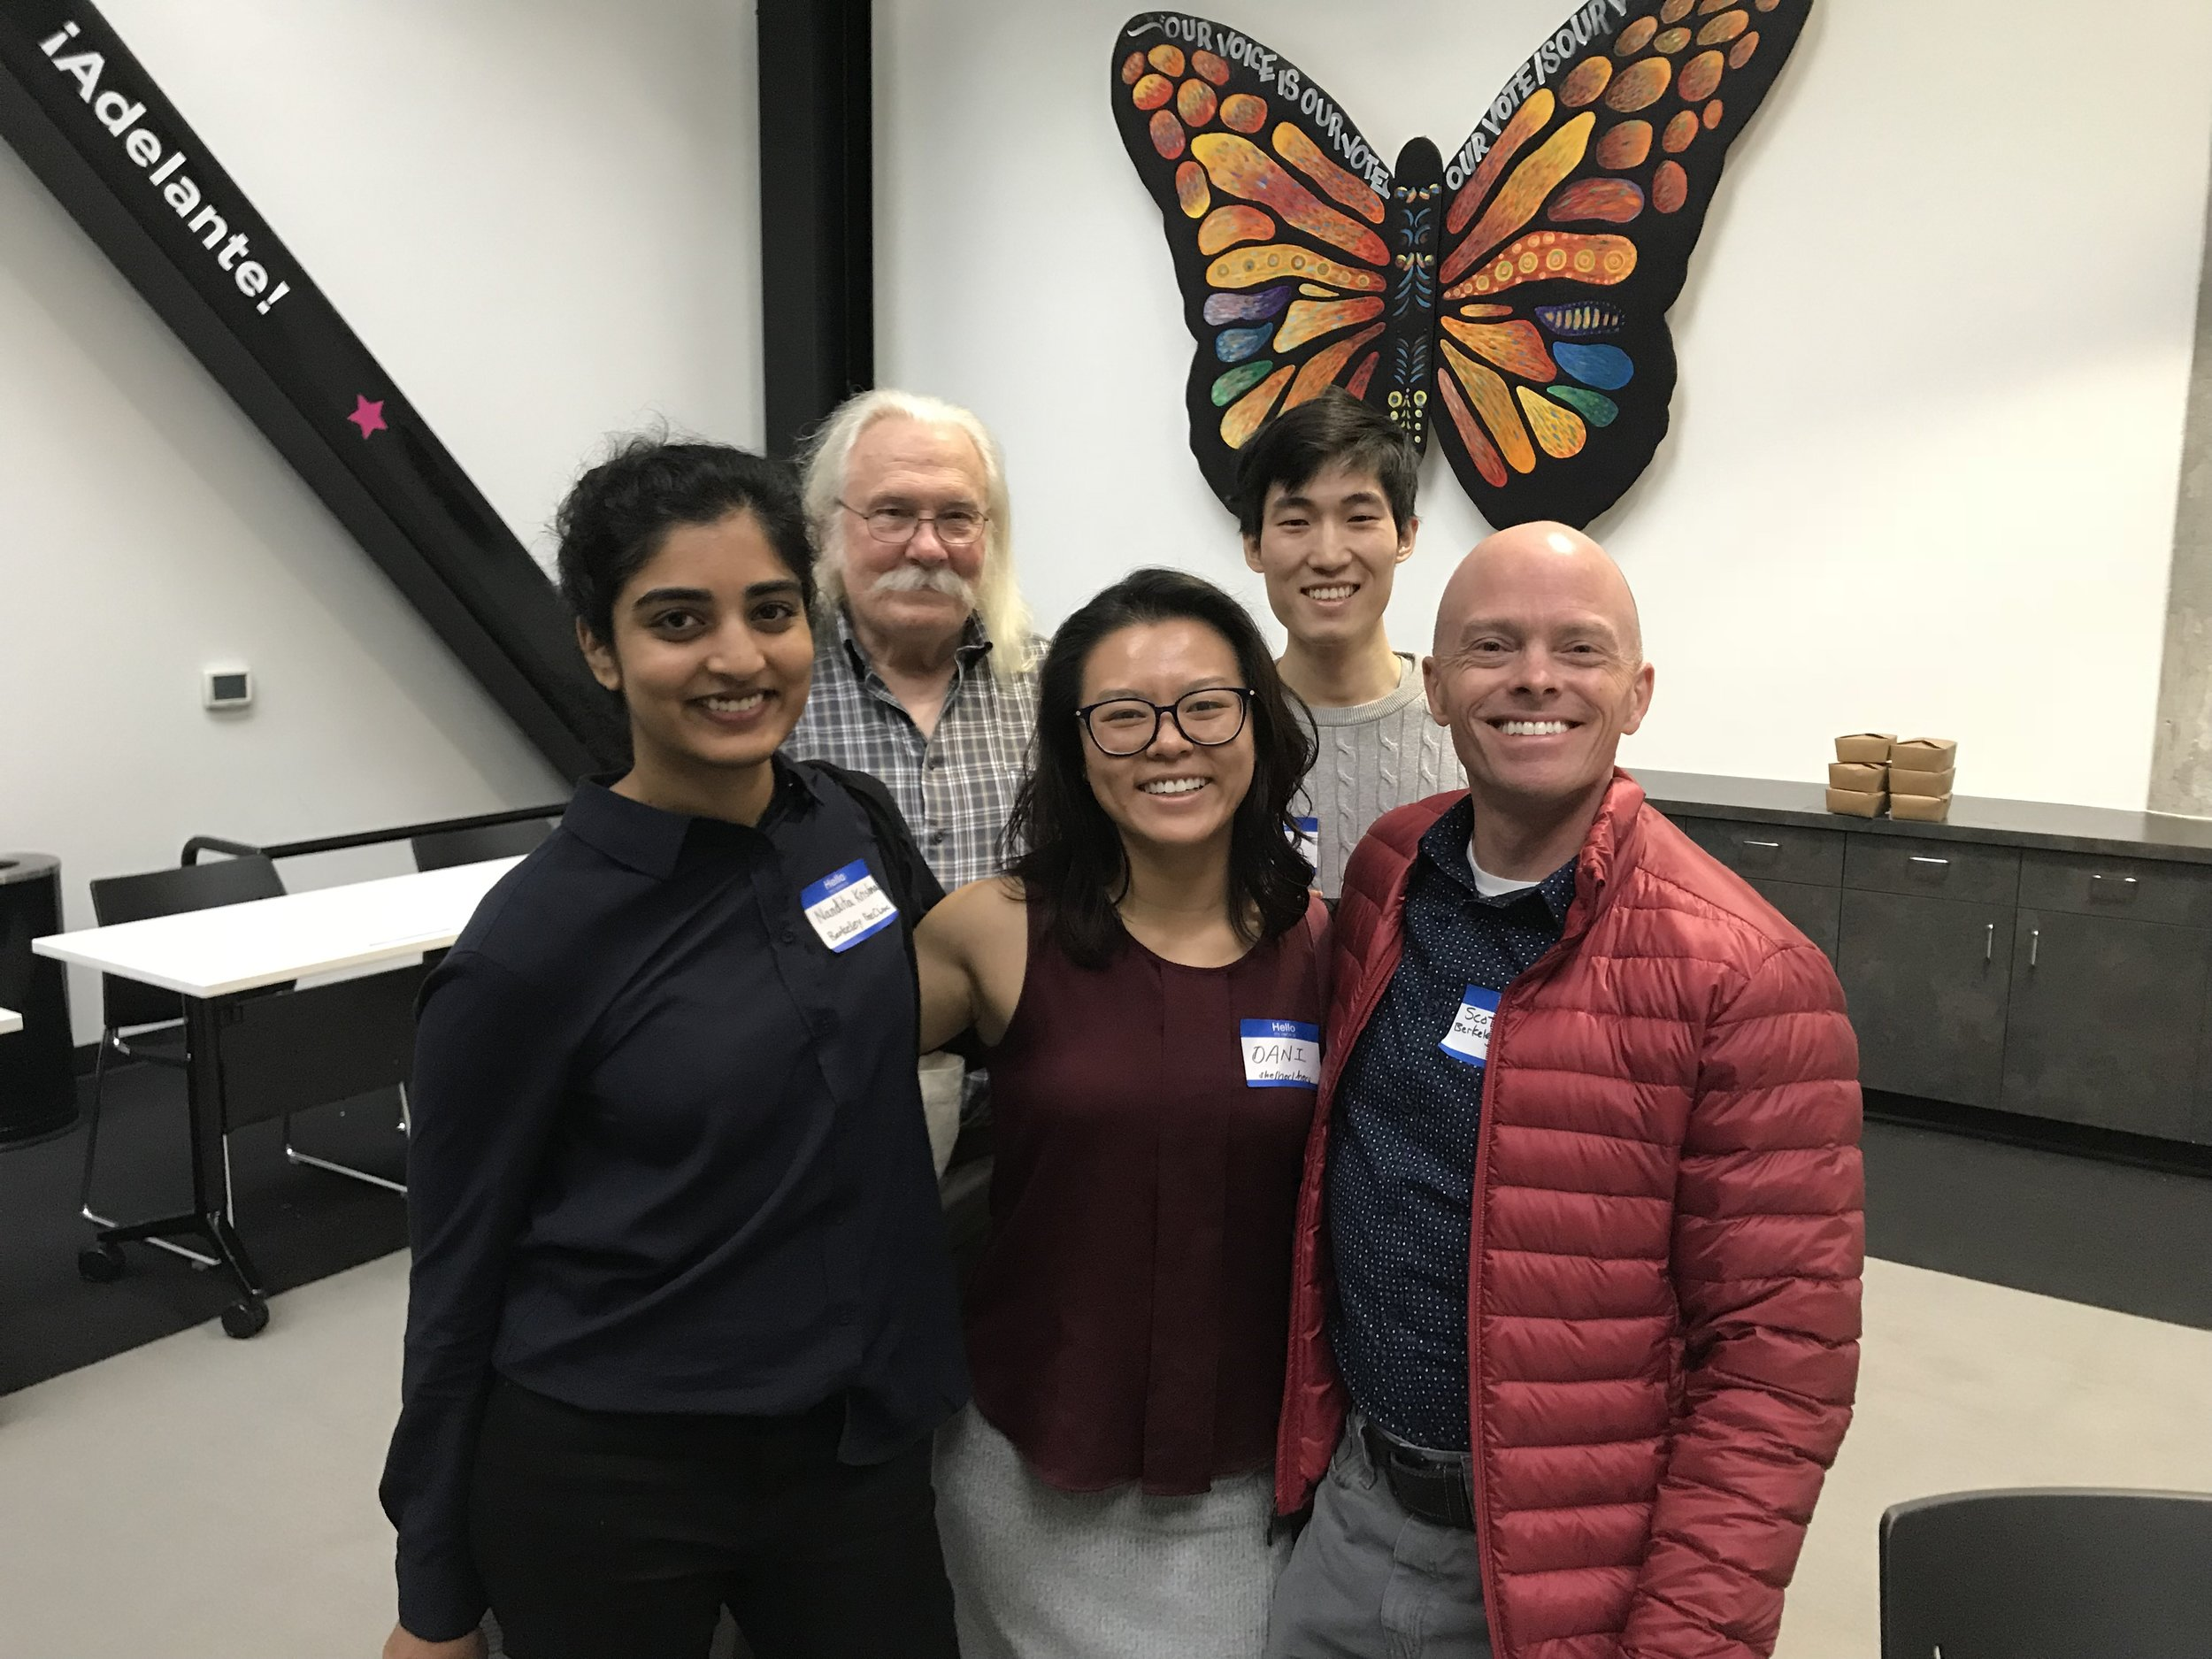 L to R: Front: Nandita (IRC), Dani (SatServ Alum), Scott (Phleb). Back: John (GMHC), Alvin (Lab)